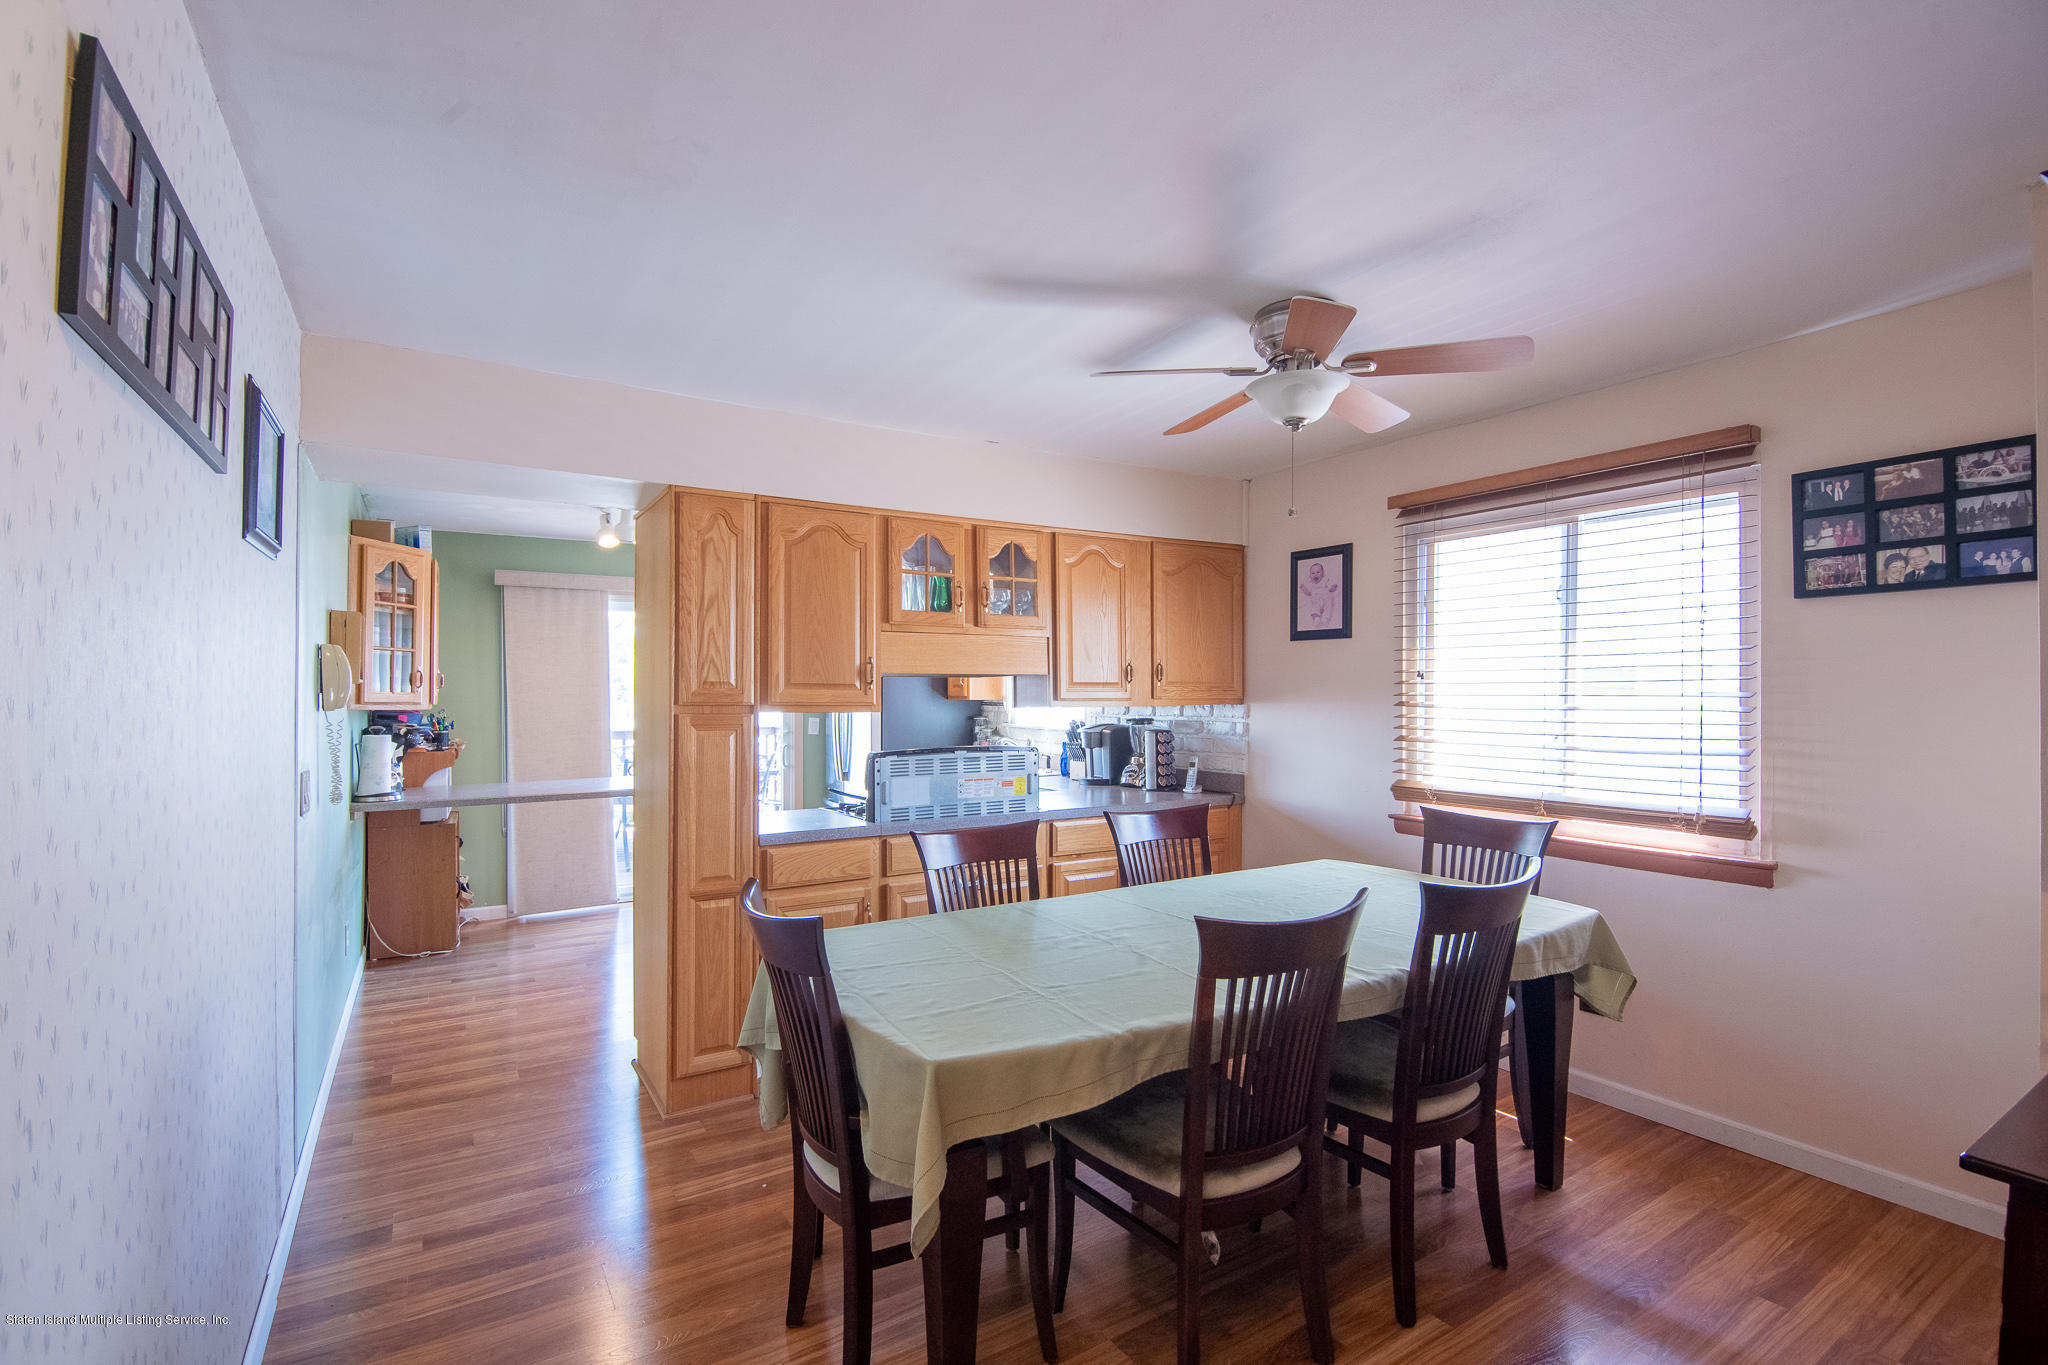 Single Family - Semi-Attached 337 Brookfield Avenue  Staten Island, NY 10308, MLS-1131002-9